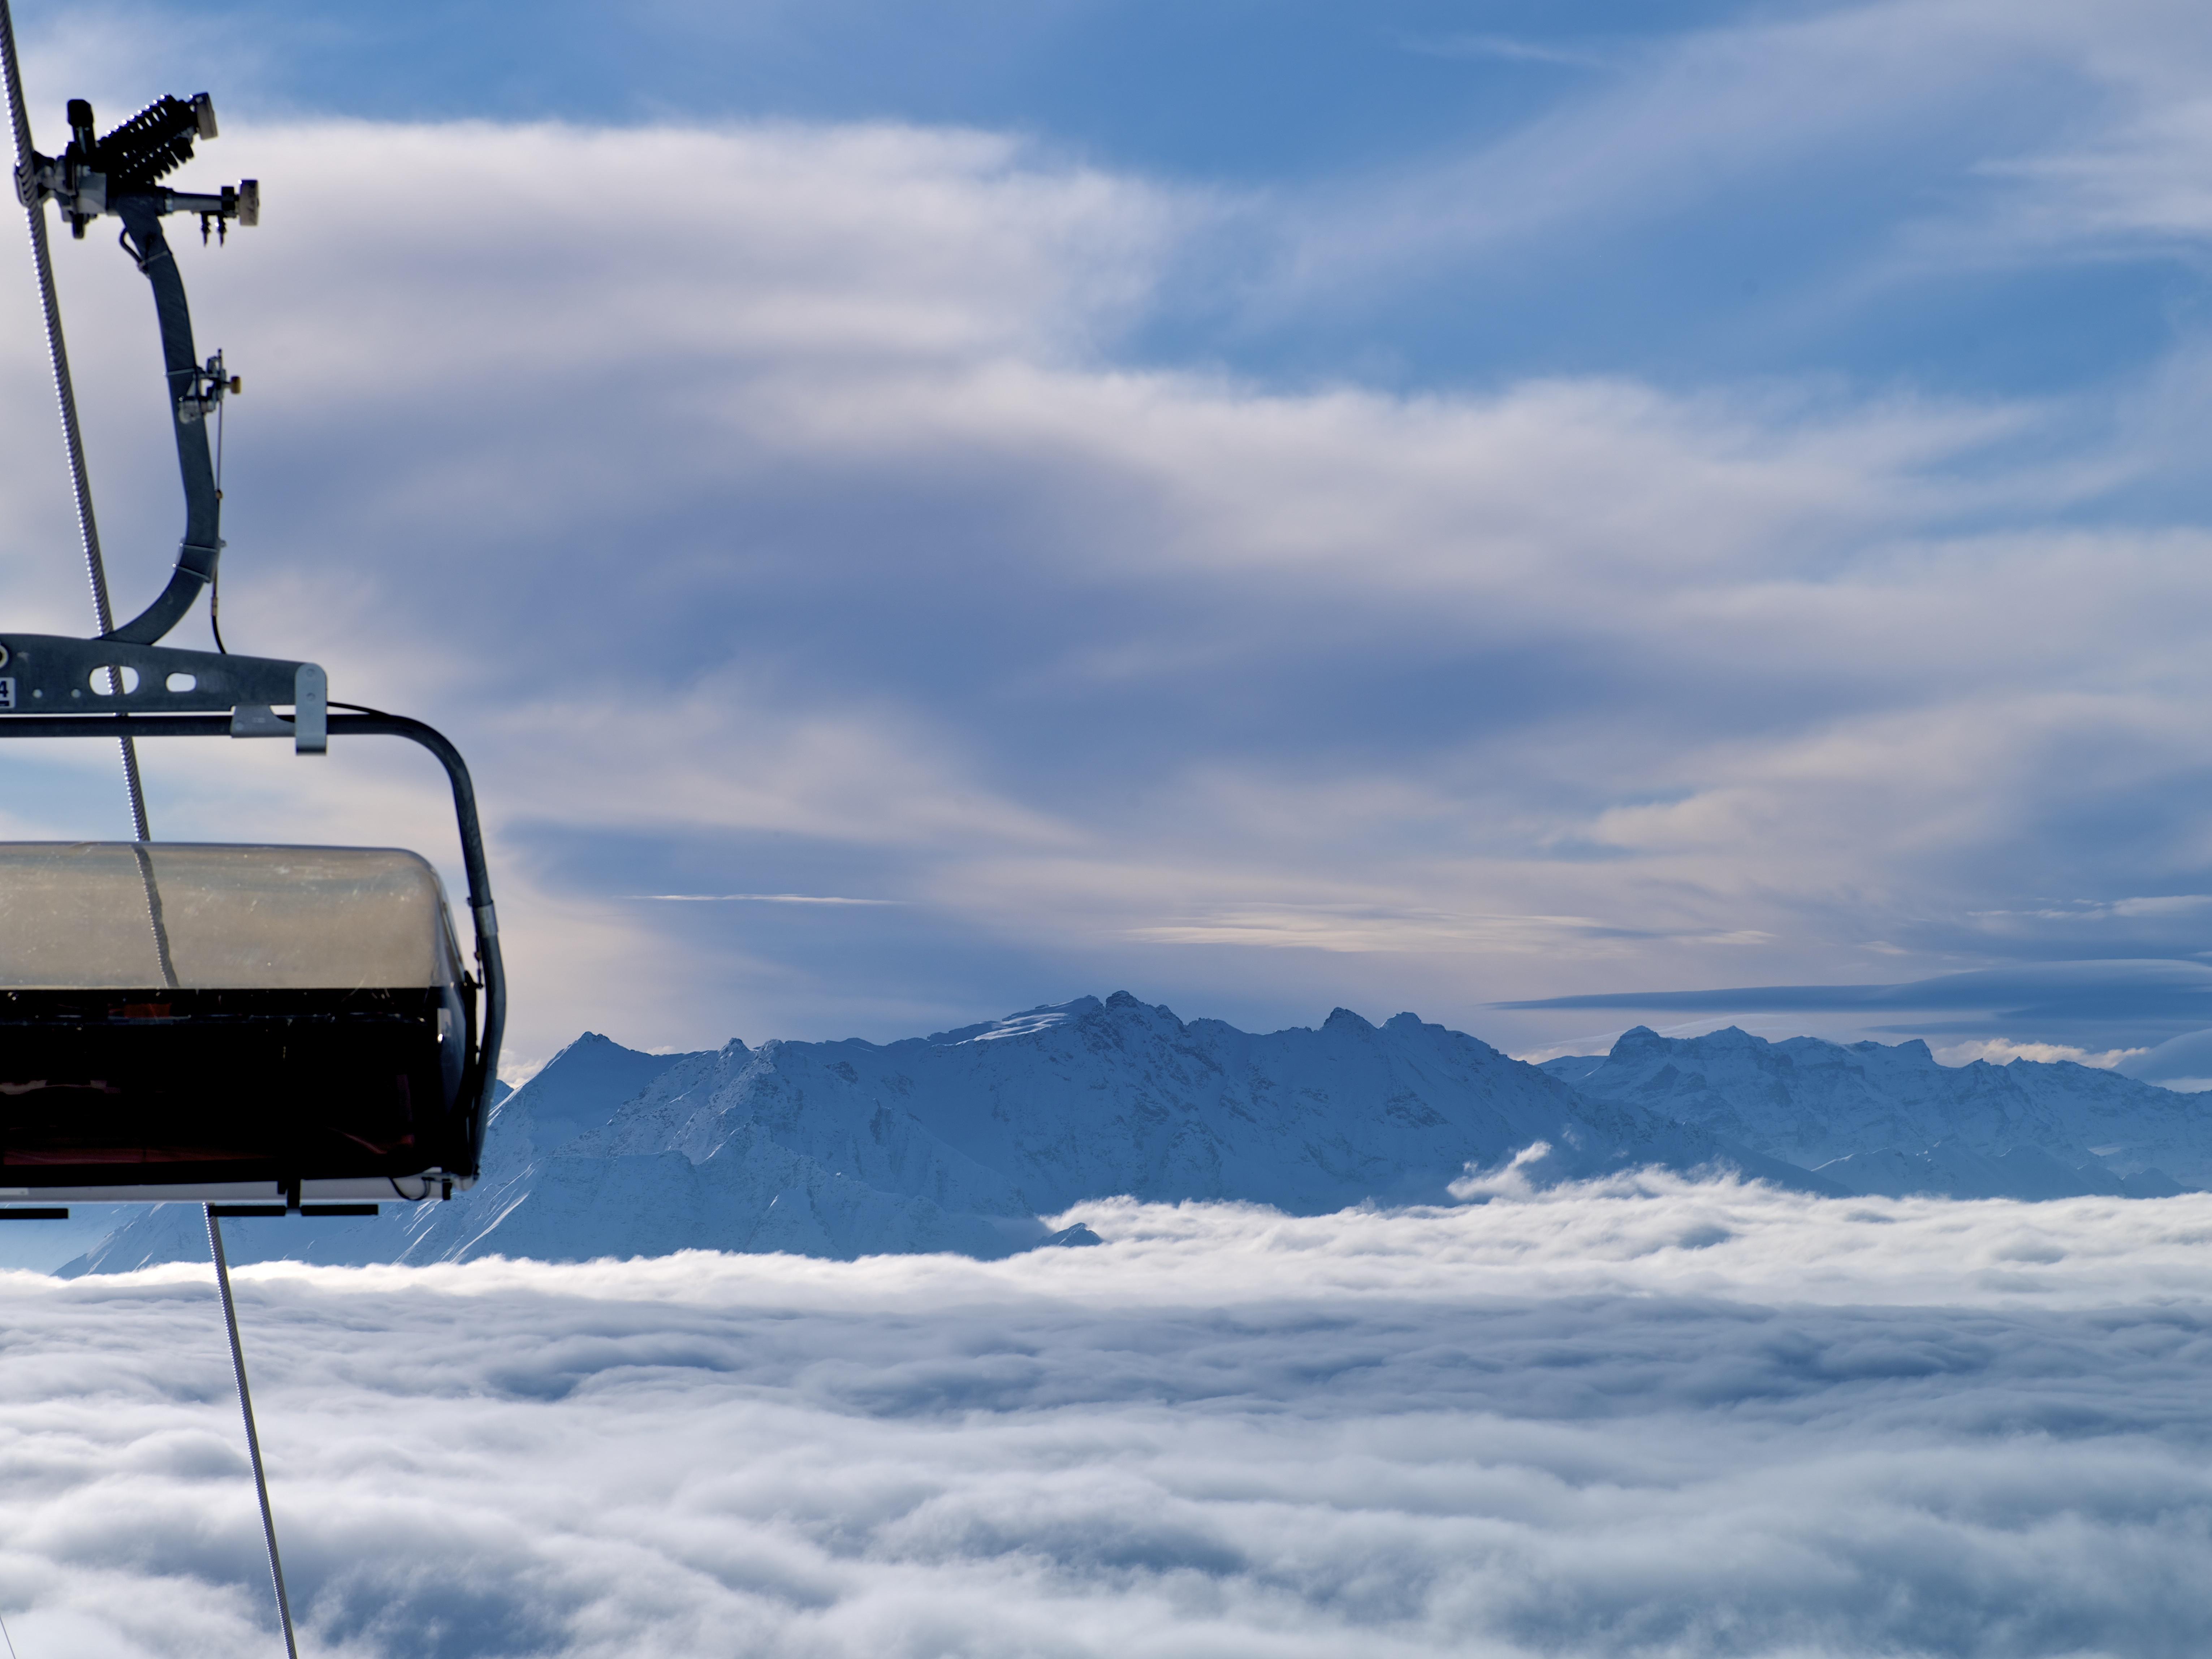 Sessel über Nebelmeer, © Weisse Arena Bergbahnen AG, Gaudenz Danuser